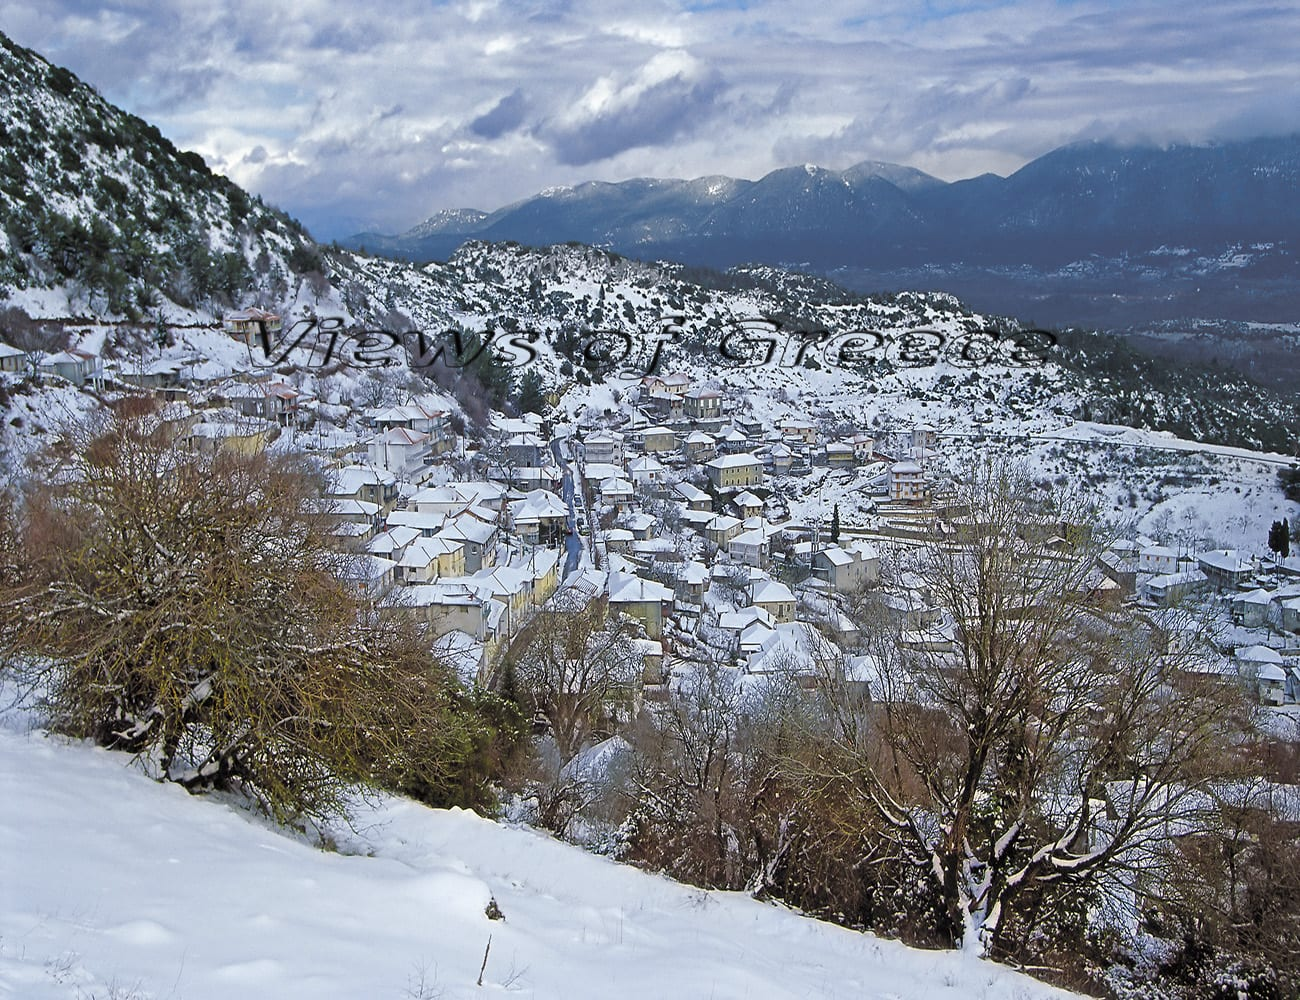 HIGHER MOUNTAIN VILLAGES, snowy villages, greece, greek, village, mountain, traditional, τα ψηλότερα ορεινά χωριά της Ελλάδας, Σαμαρίνα, Σμόλικας, Αετομηλίτσα, Γράμμος, Τύμφη, Βραδέτο, Κεντρικό Ζαγόρι, Αρκαδία, Πελοπόννησος, Μαγούλιανα, Μαίναλο, άγνωστη Ελλάδα, αποδράσεις, χιόνι, εκδρομές στο χιόνι